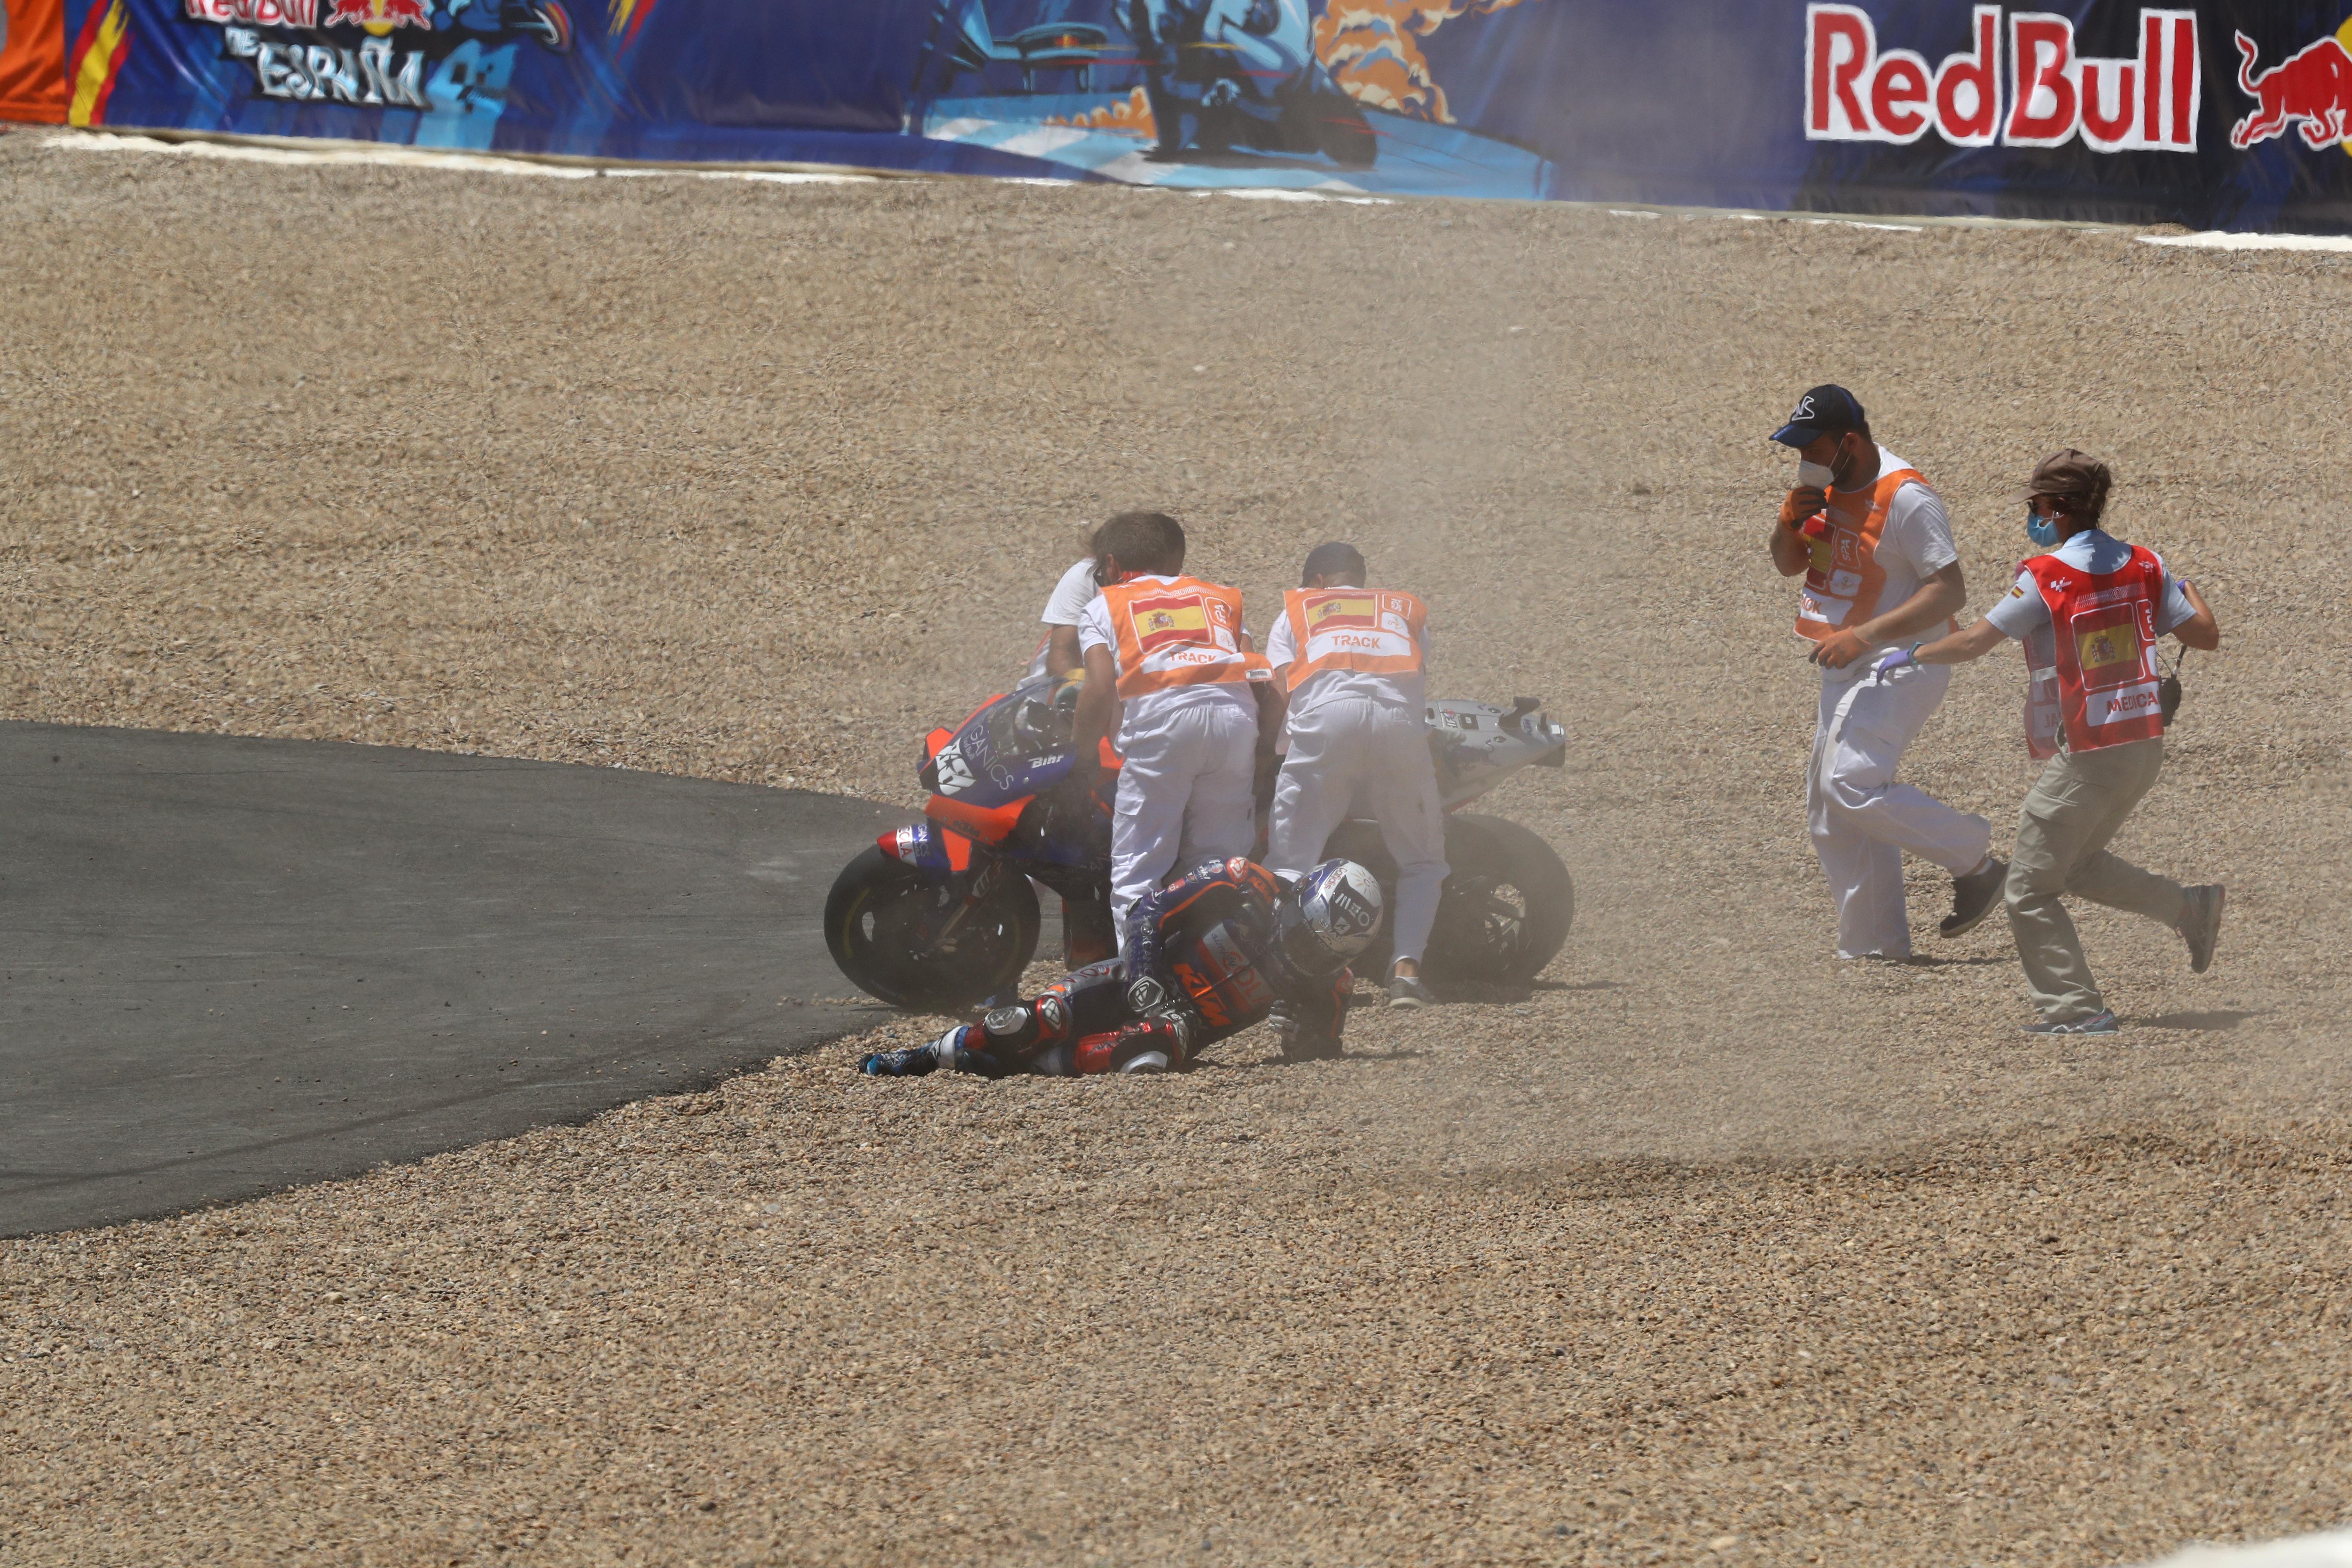 Miguel Oliveira crash